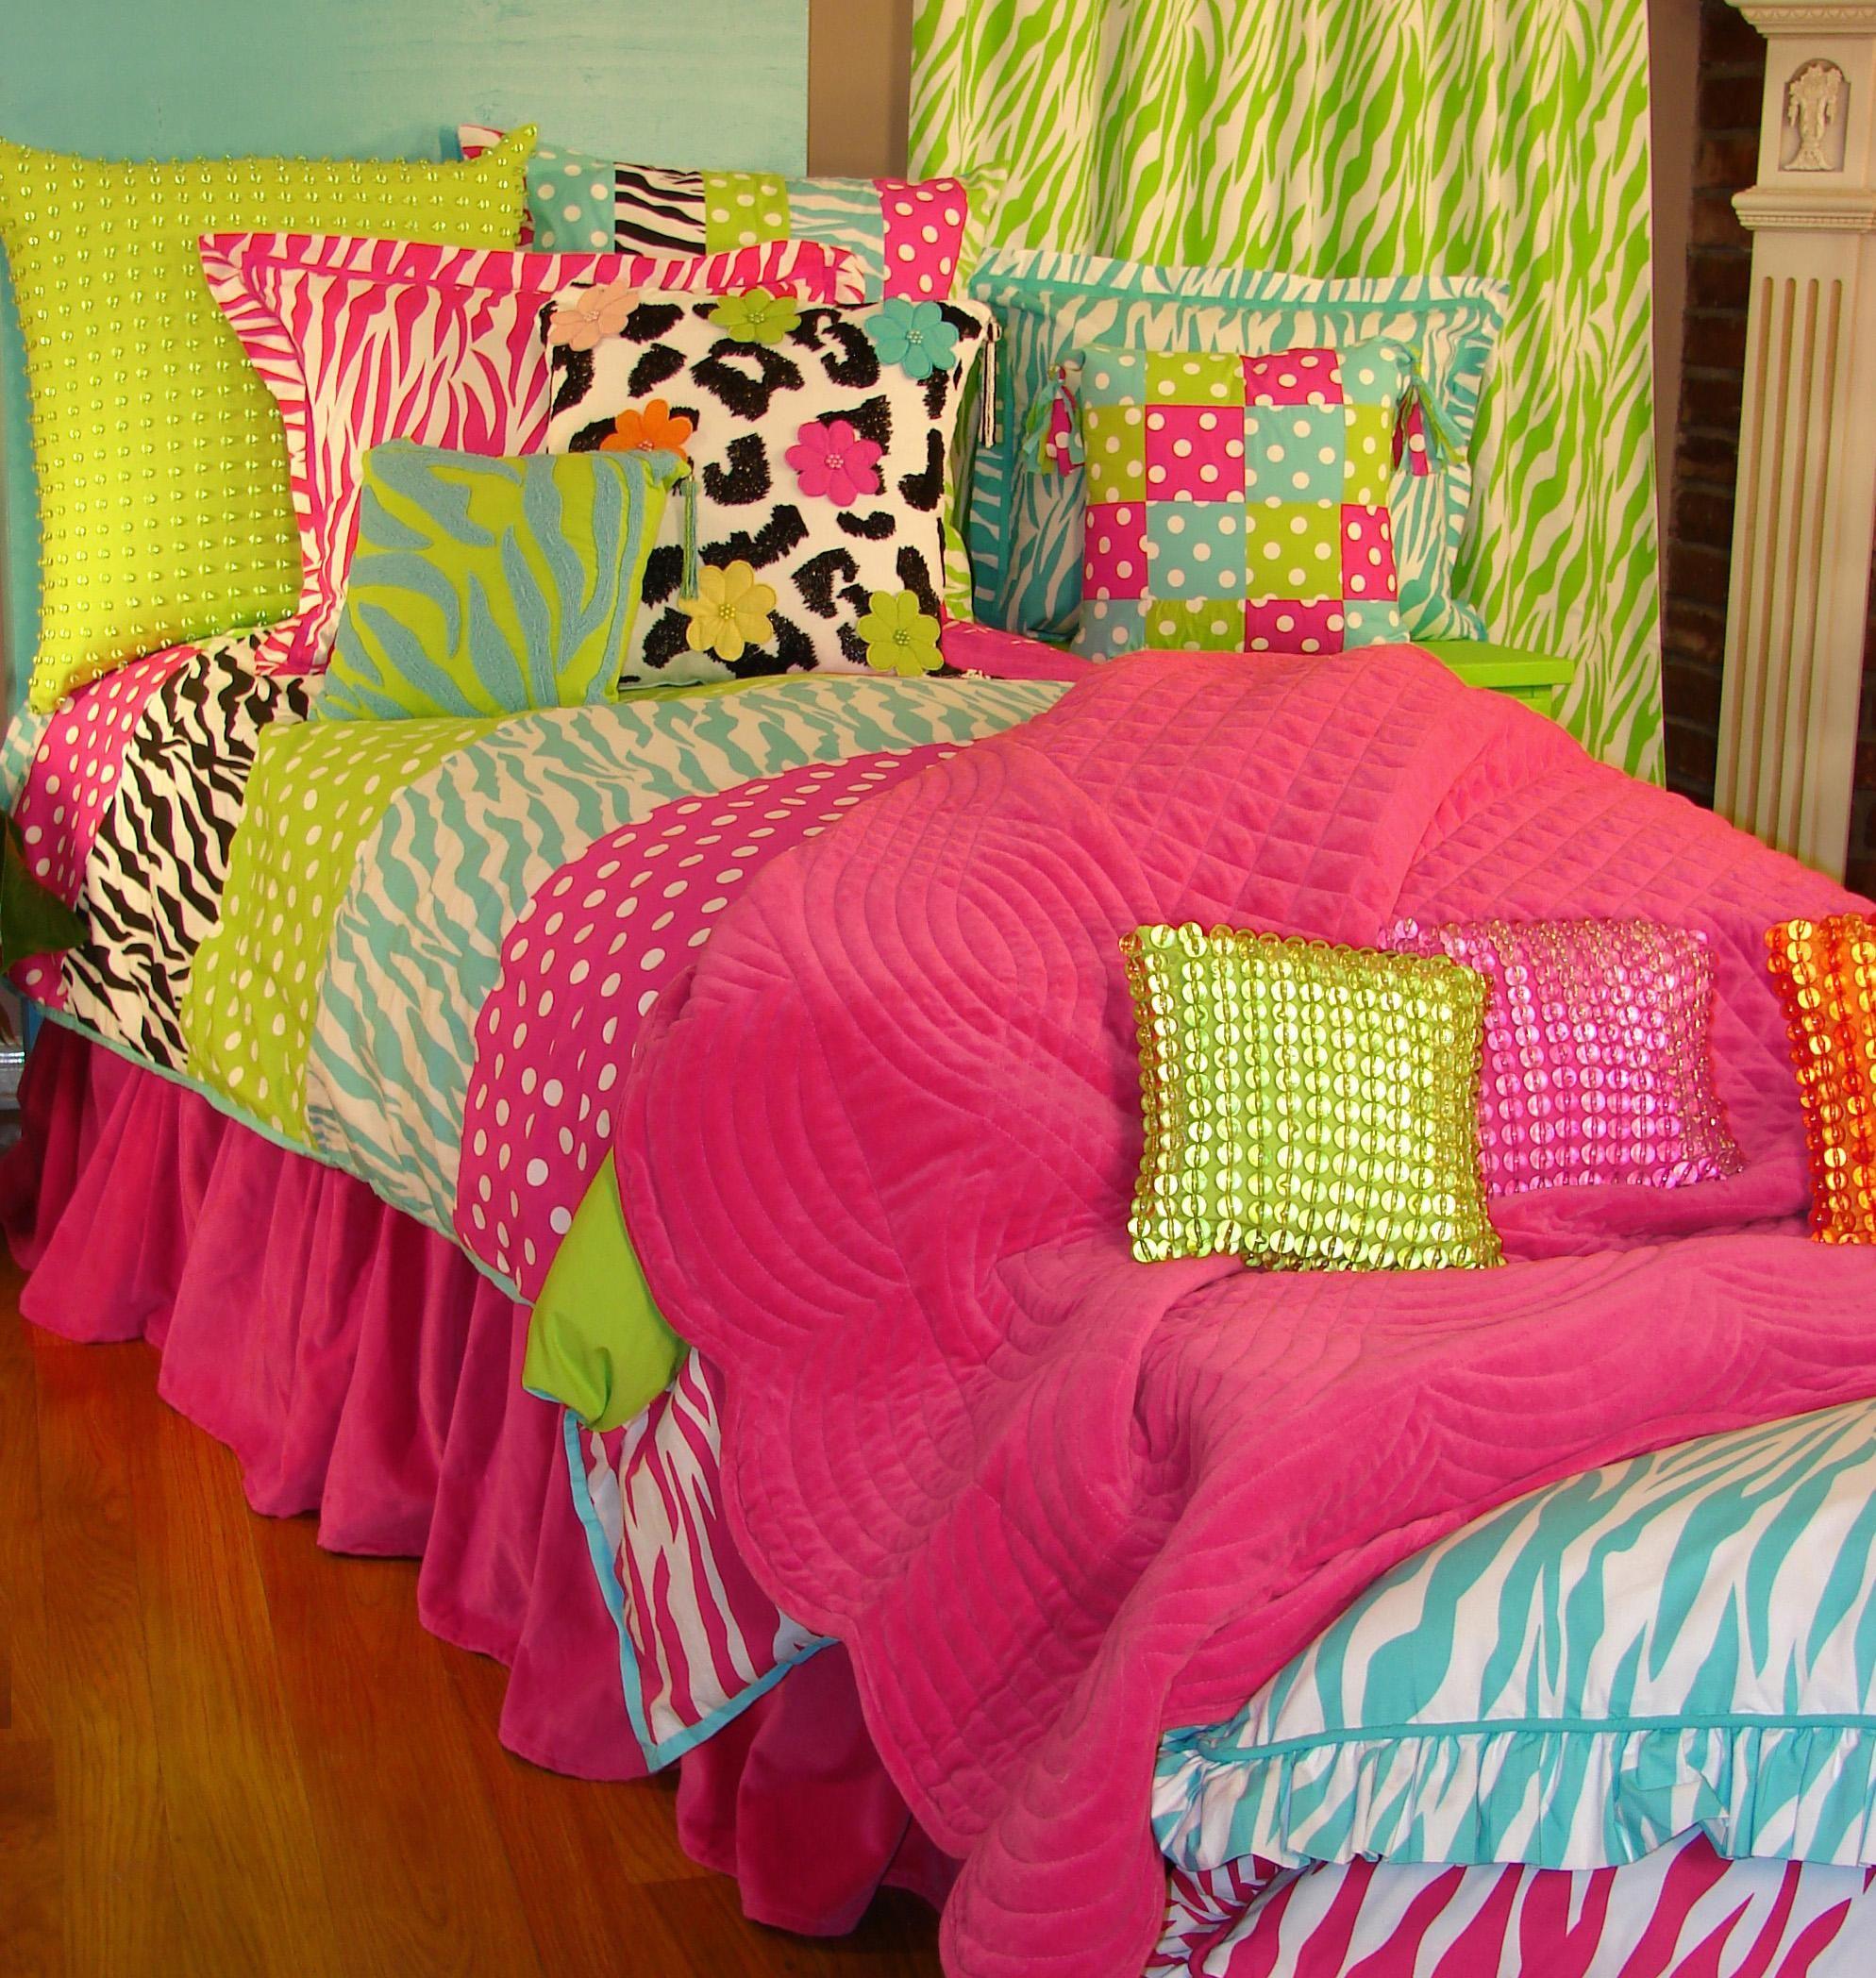 Beautify your bedroom with zebra bedding